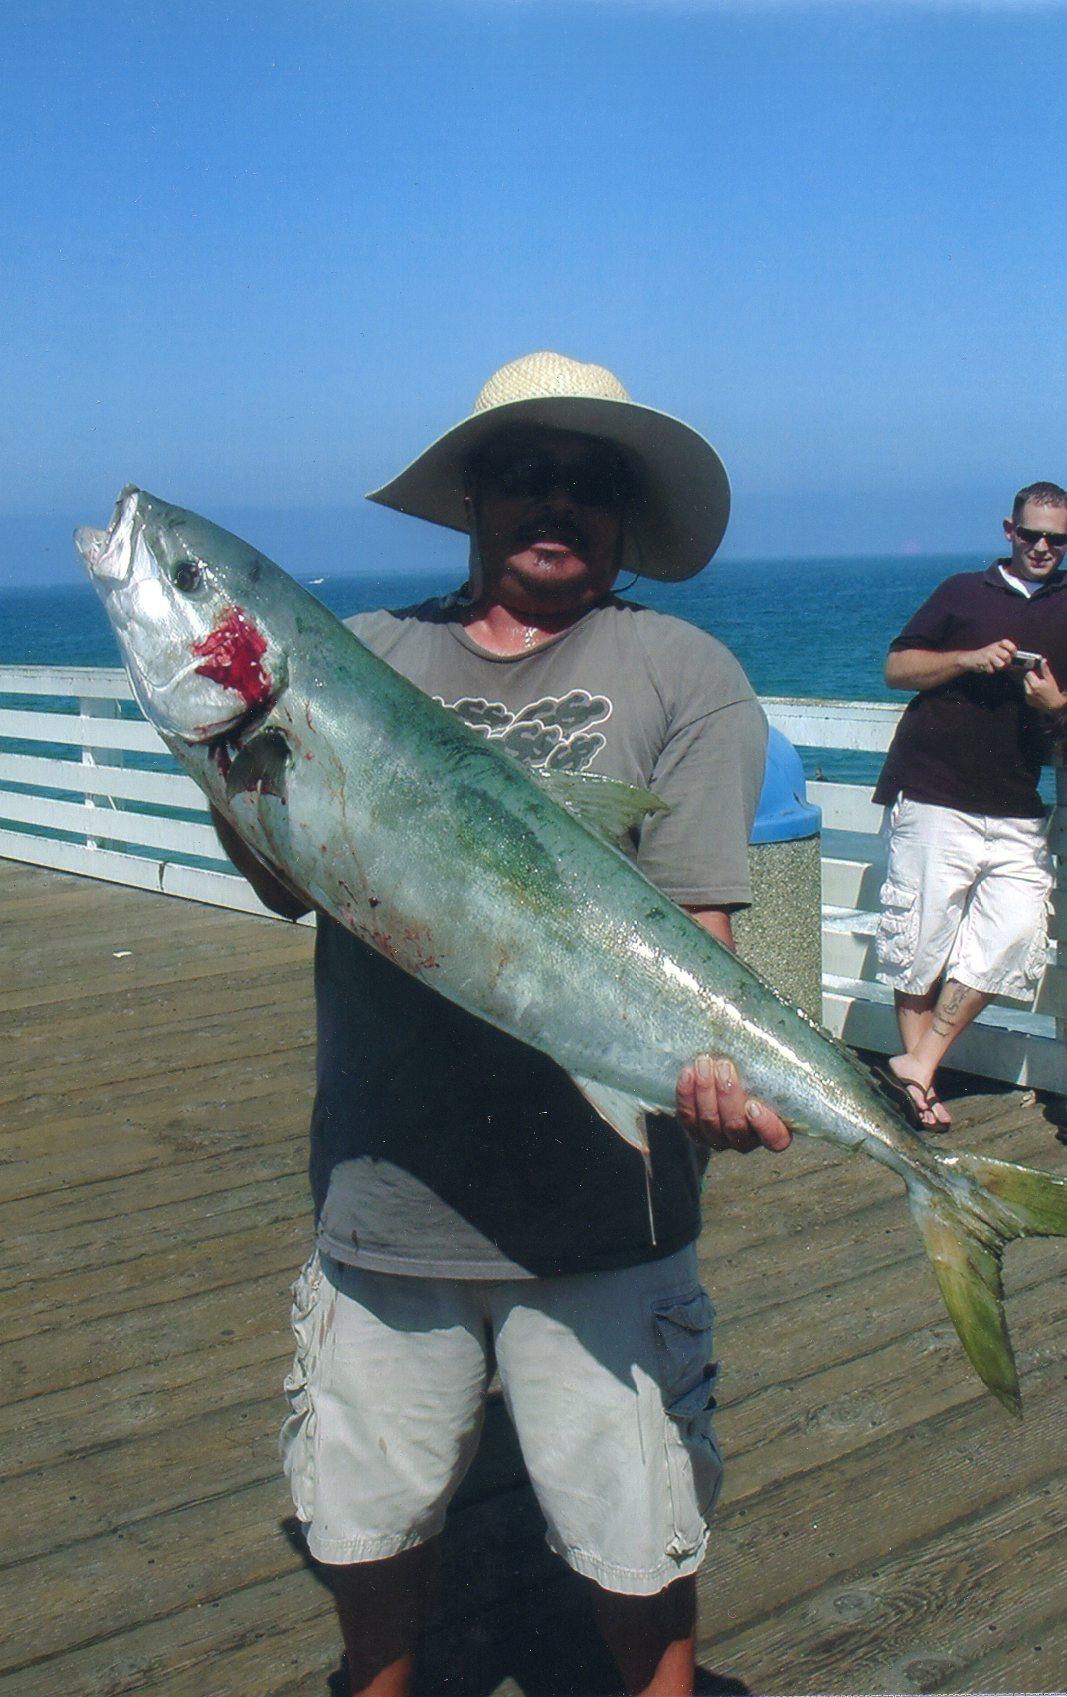 Crystal pier yellowtail 8 2012 for Jones beach fishing pier